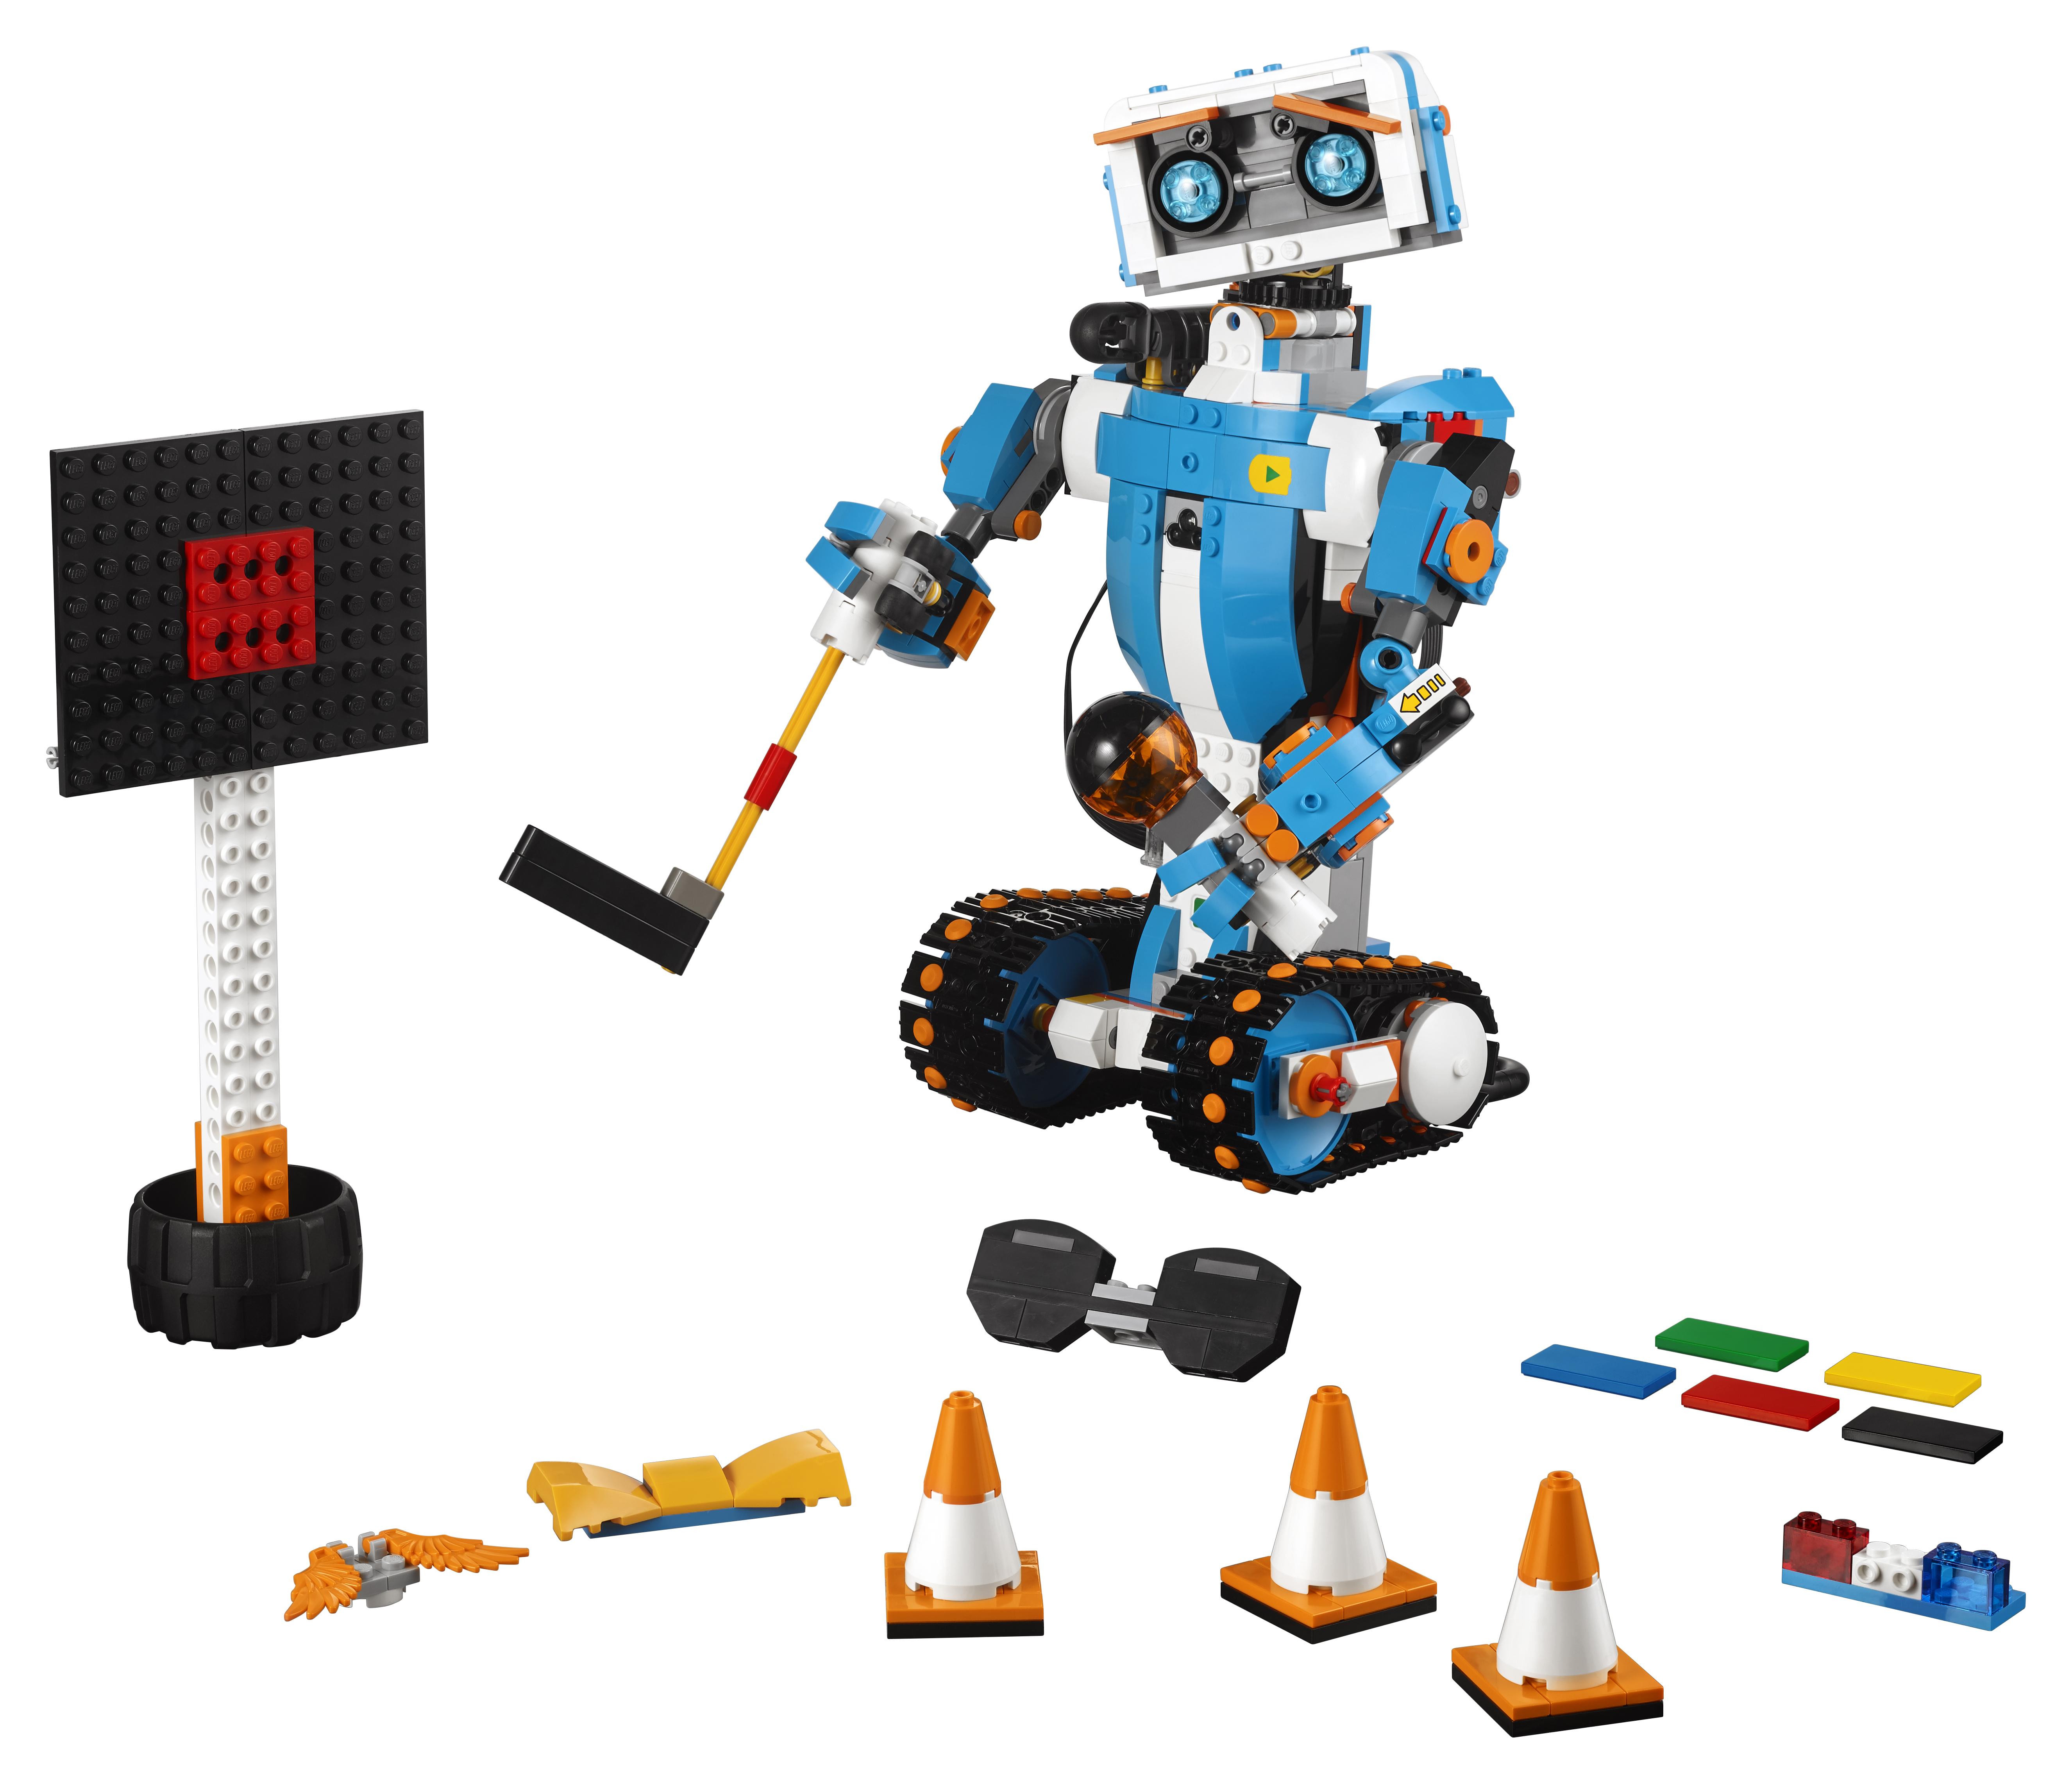 LEGO Boost 17101 Programmierbares Roboticset 500-17101